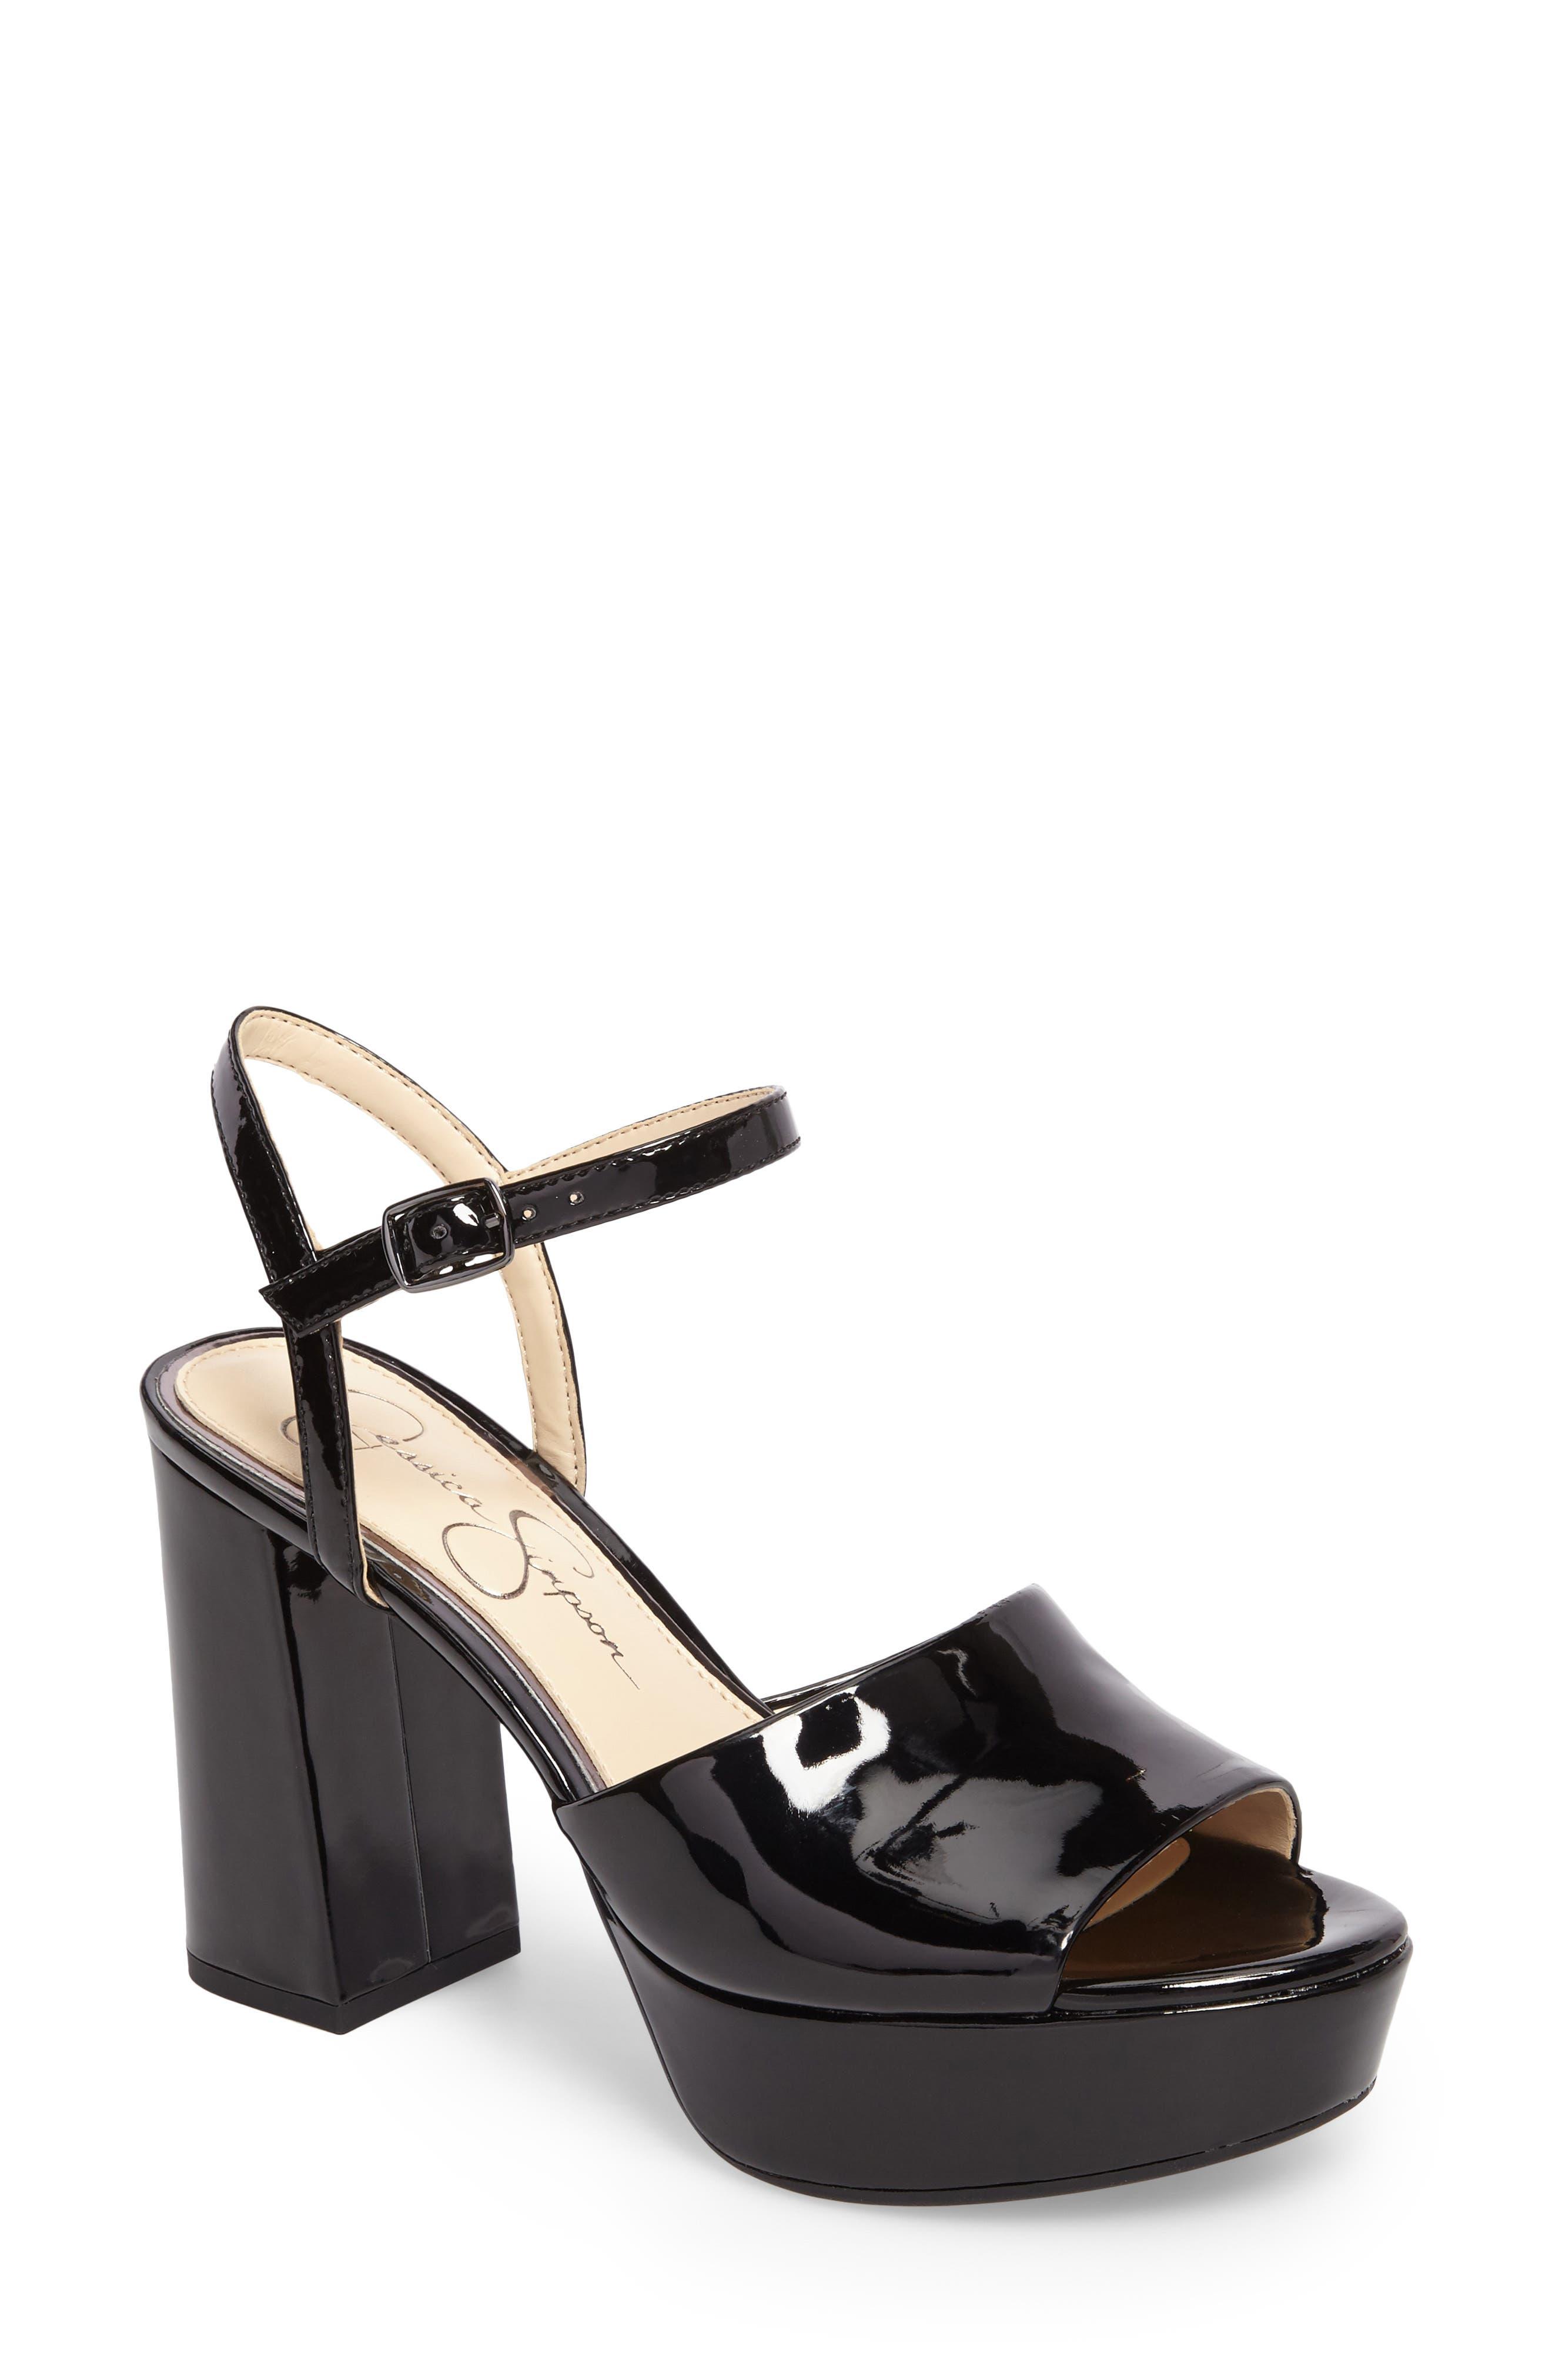 Kerrick Platform Sandal,                         Main,                         color, Black Patent Leather